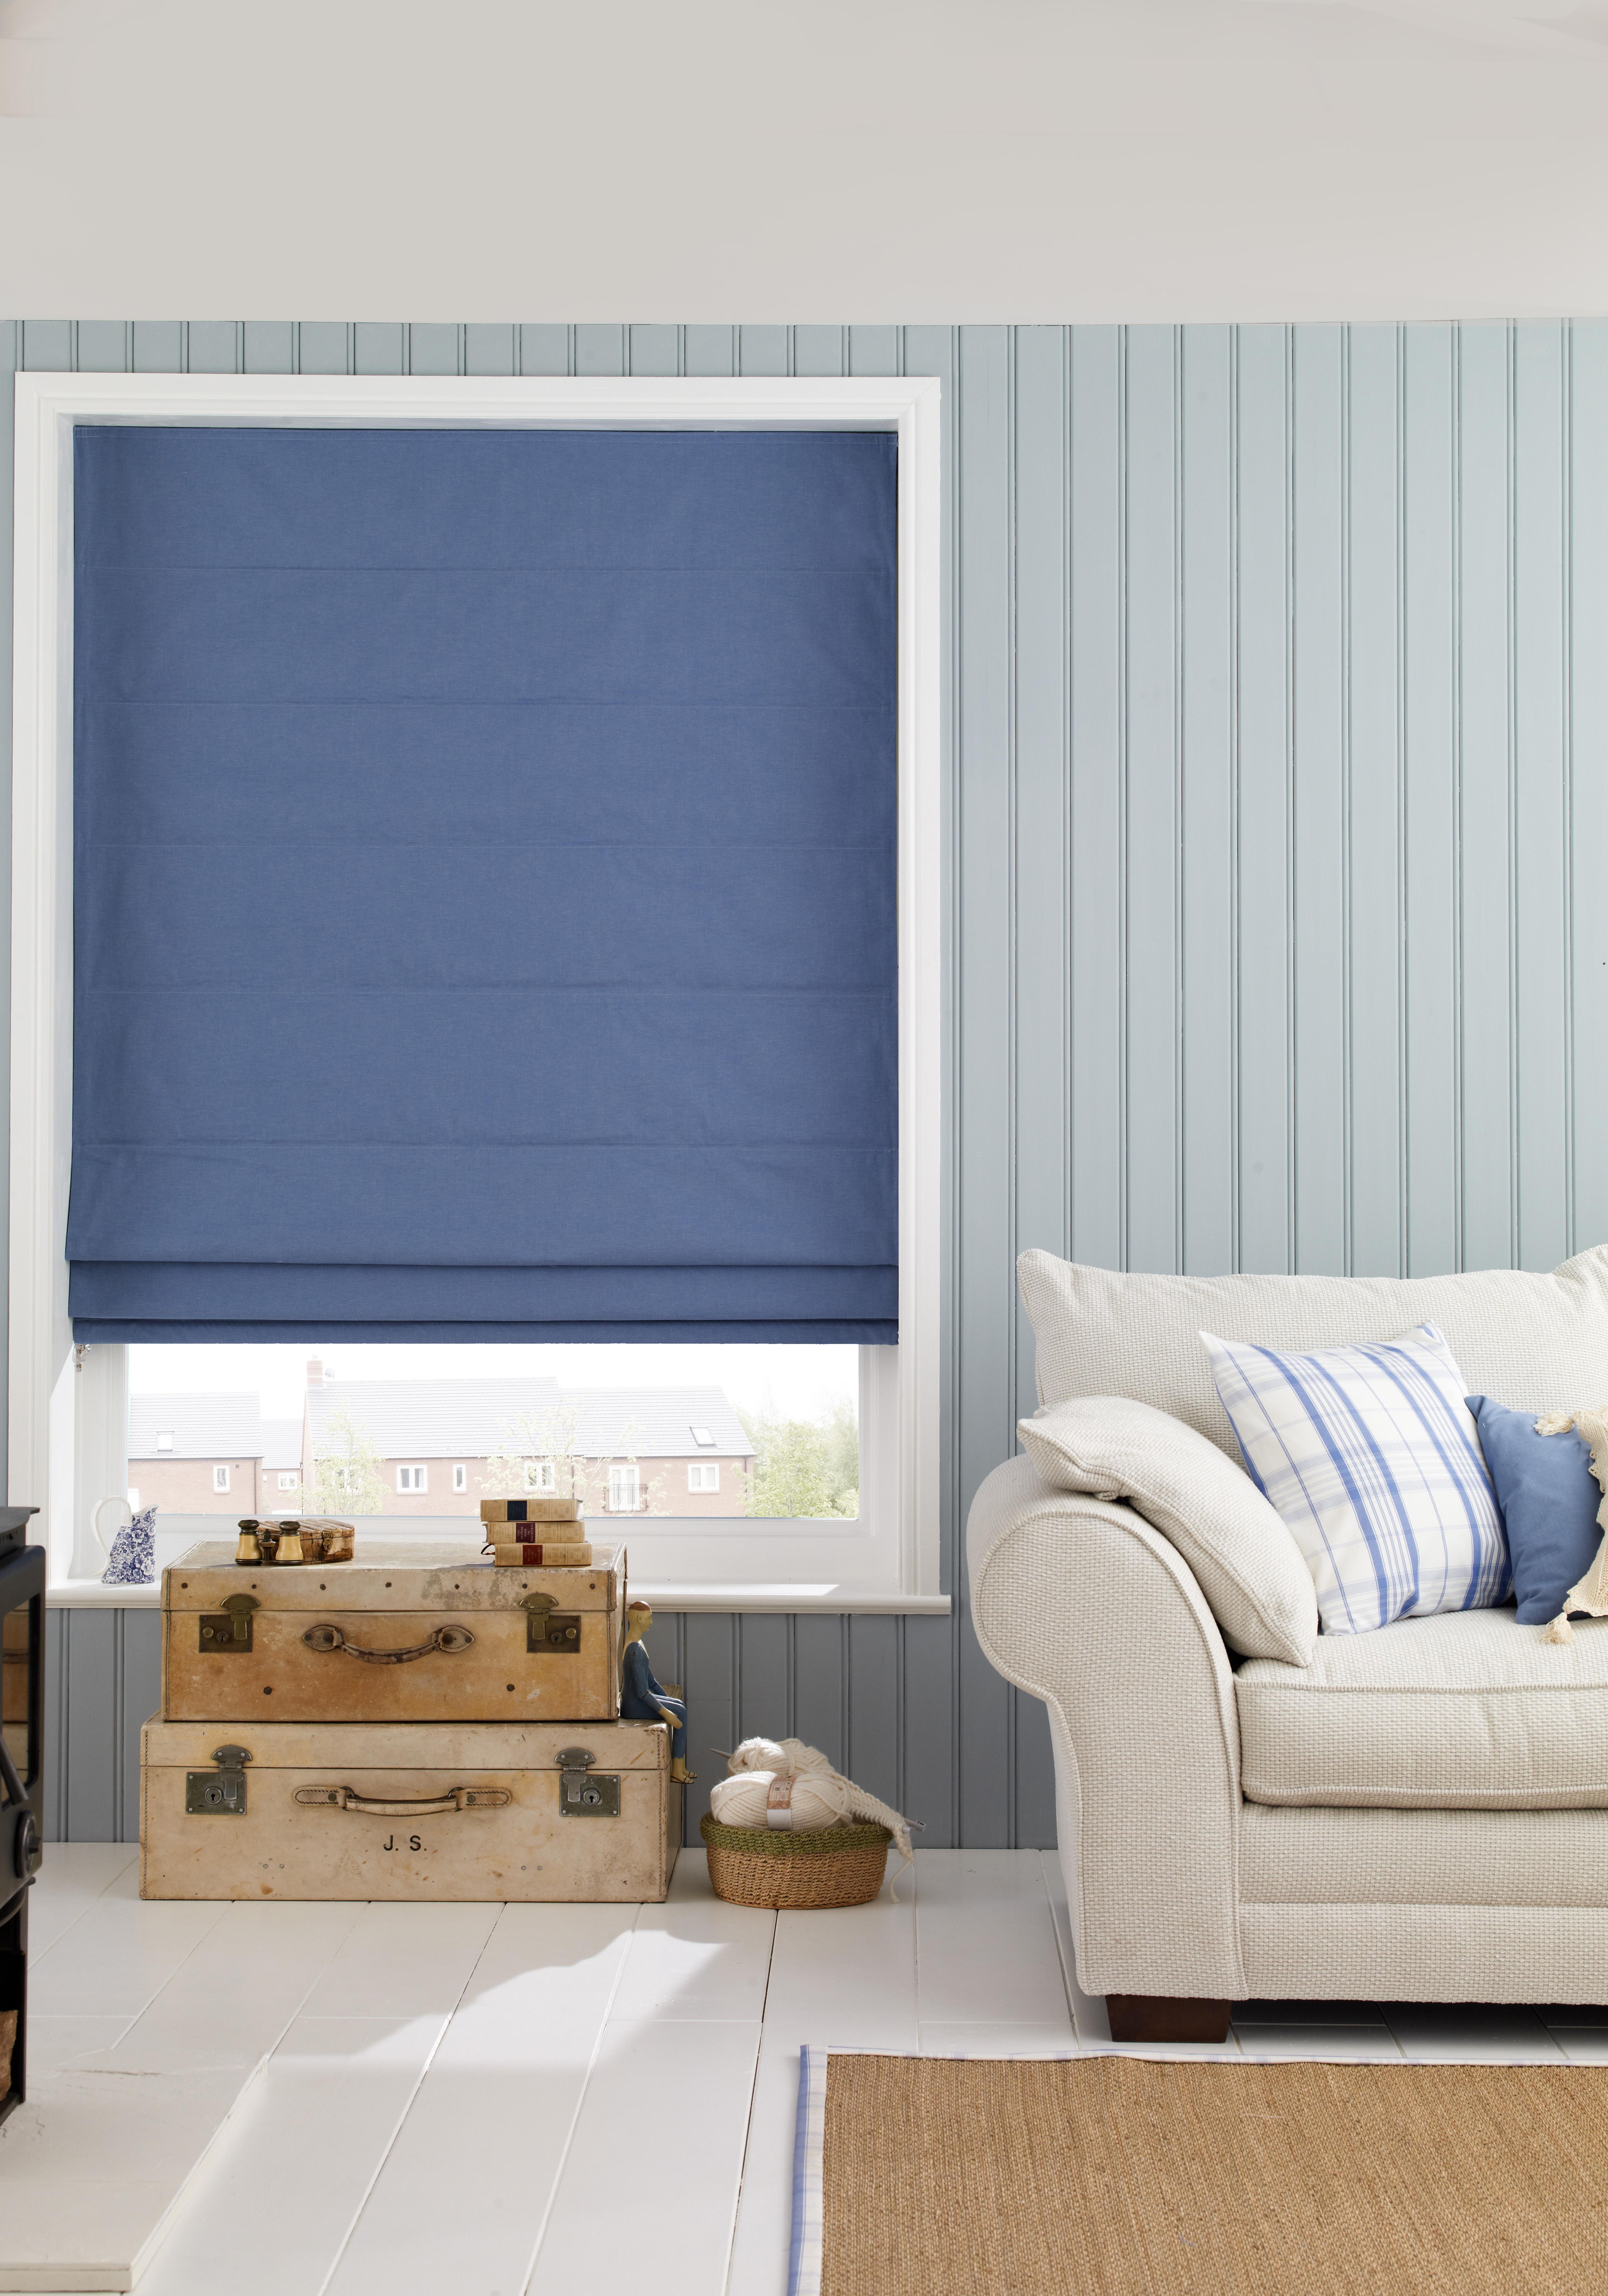 cr technical product for iv baumann r ation produkt un looking blinds en basic solutions bild cleaner